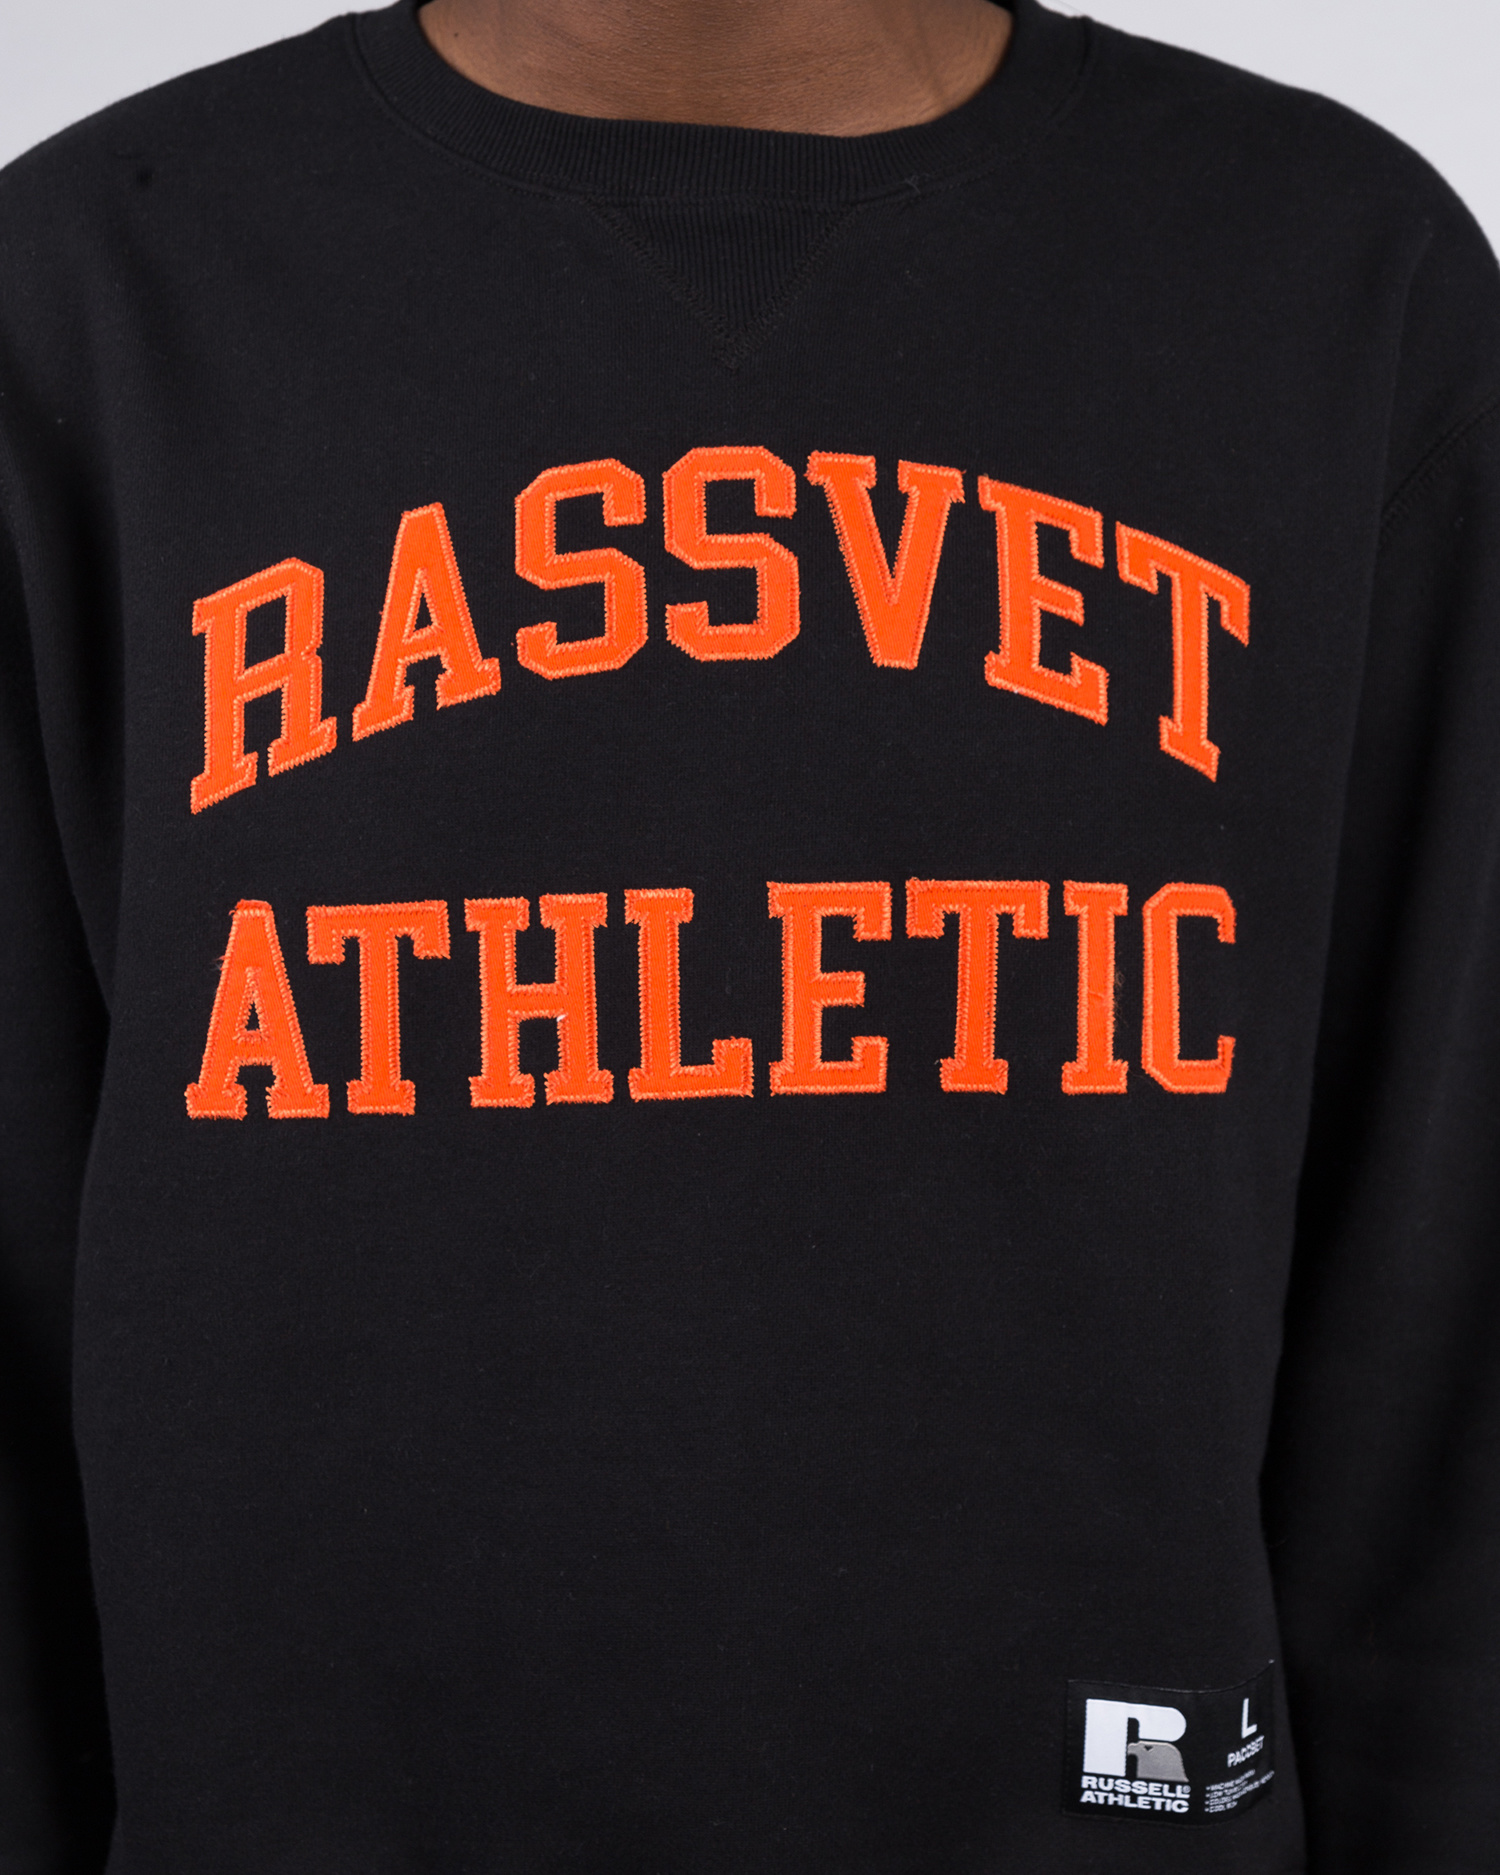 Paccbet X Russel Athletic crewneck Black